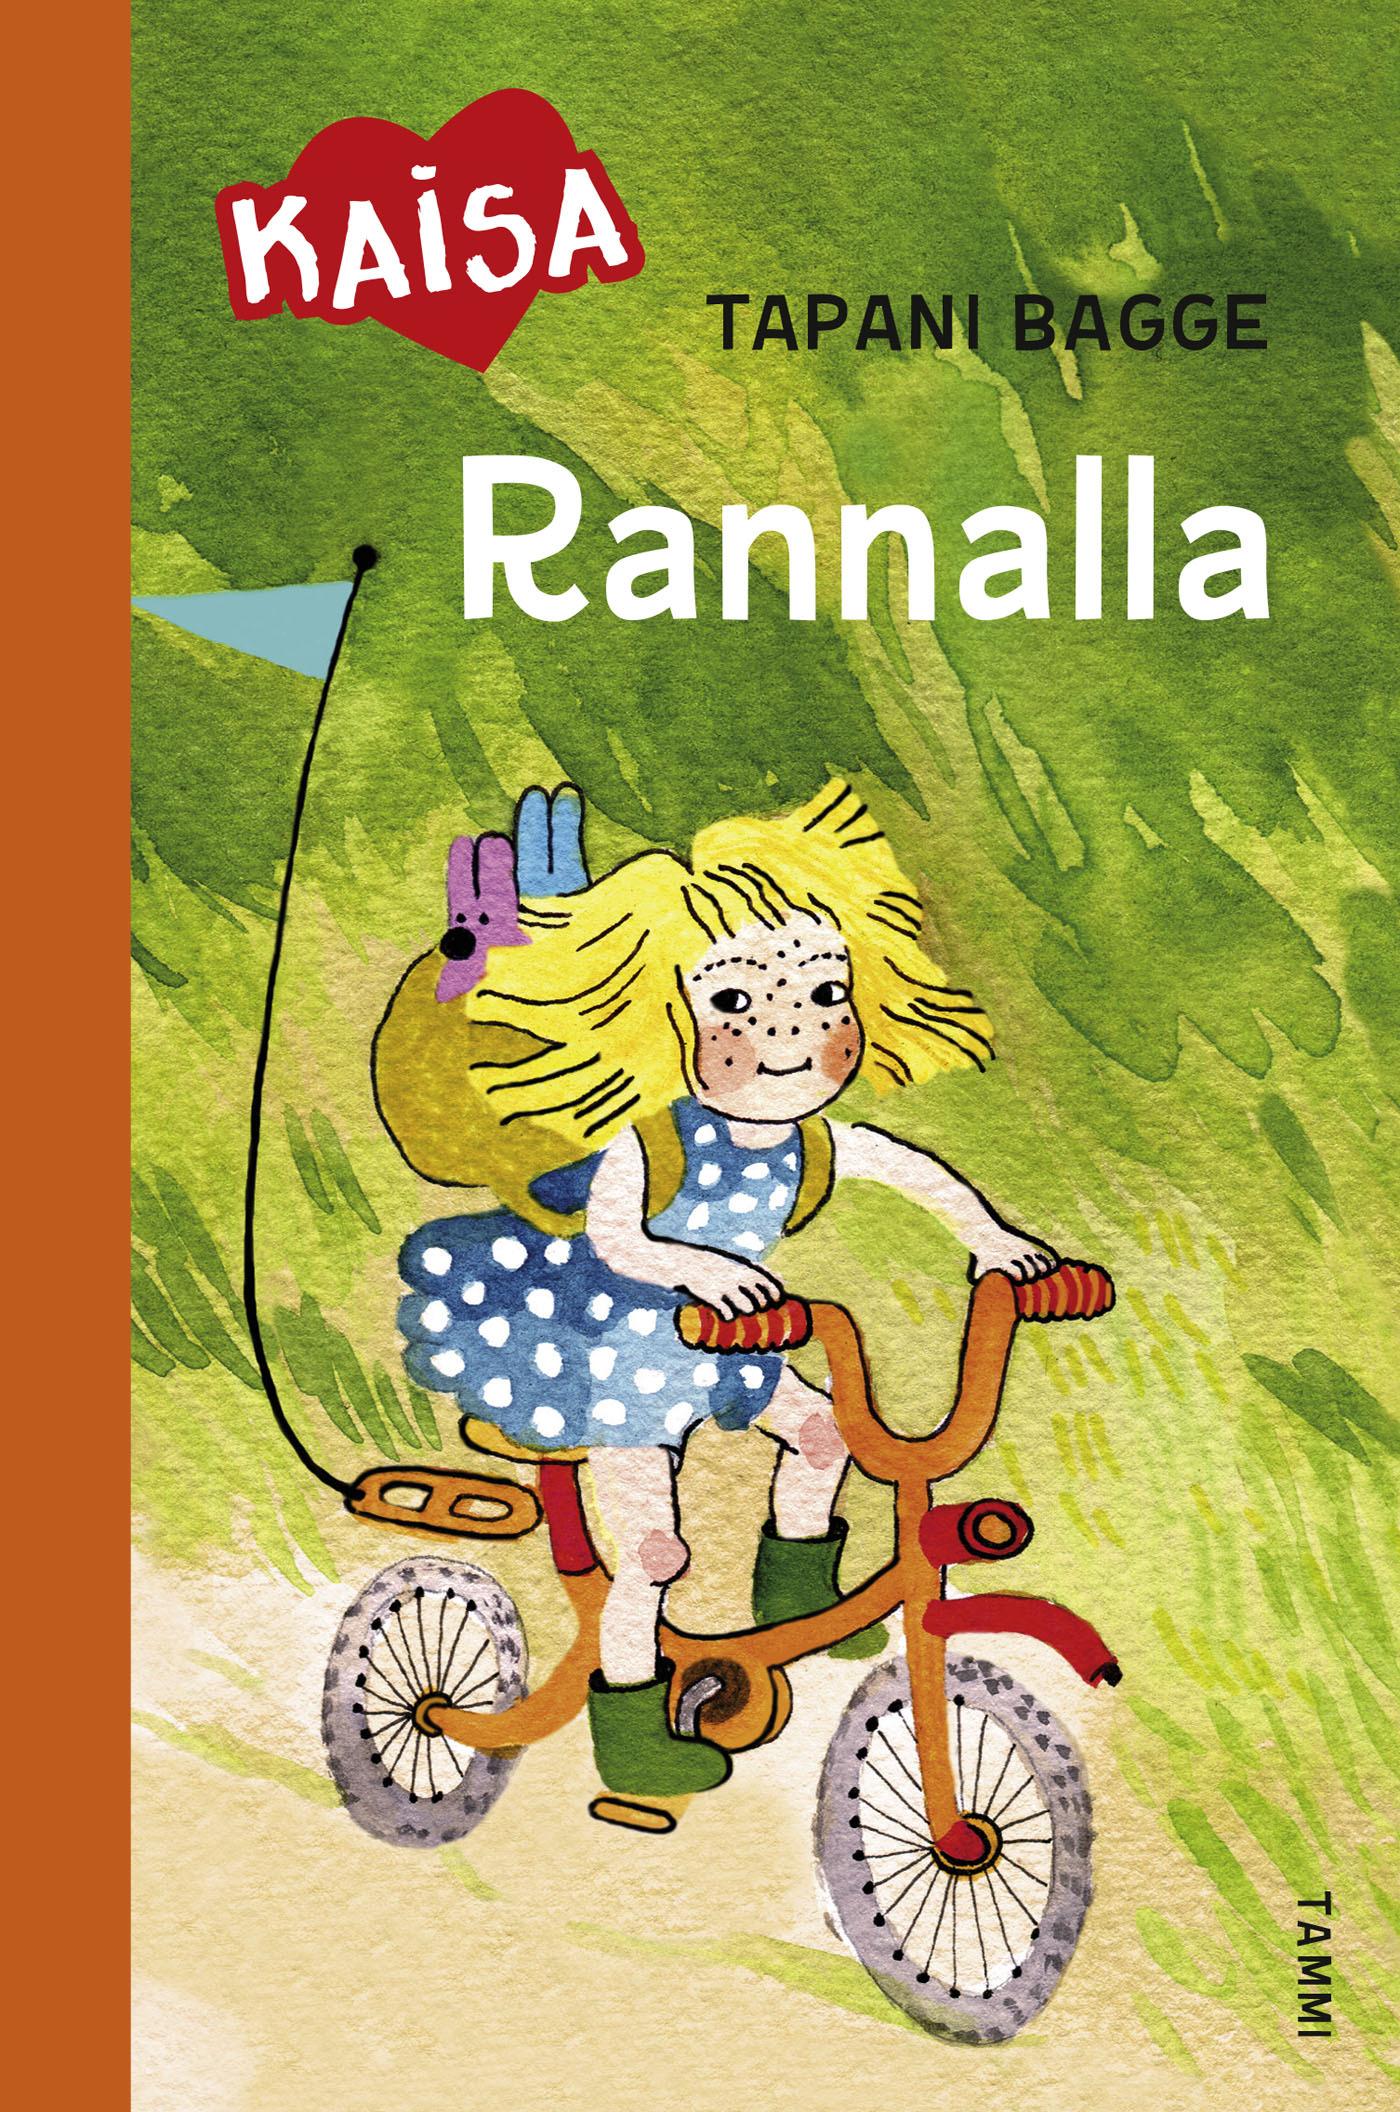 Bagge, Tapani - Rannalla (Kaisa-sarja), e-kirja